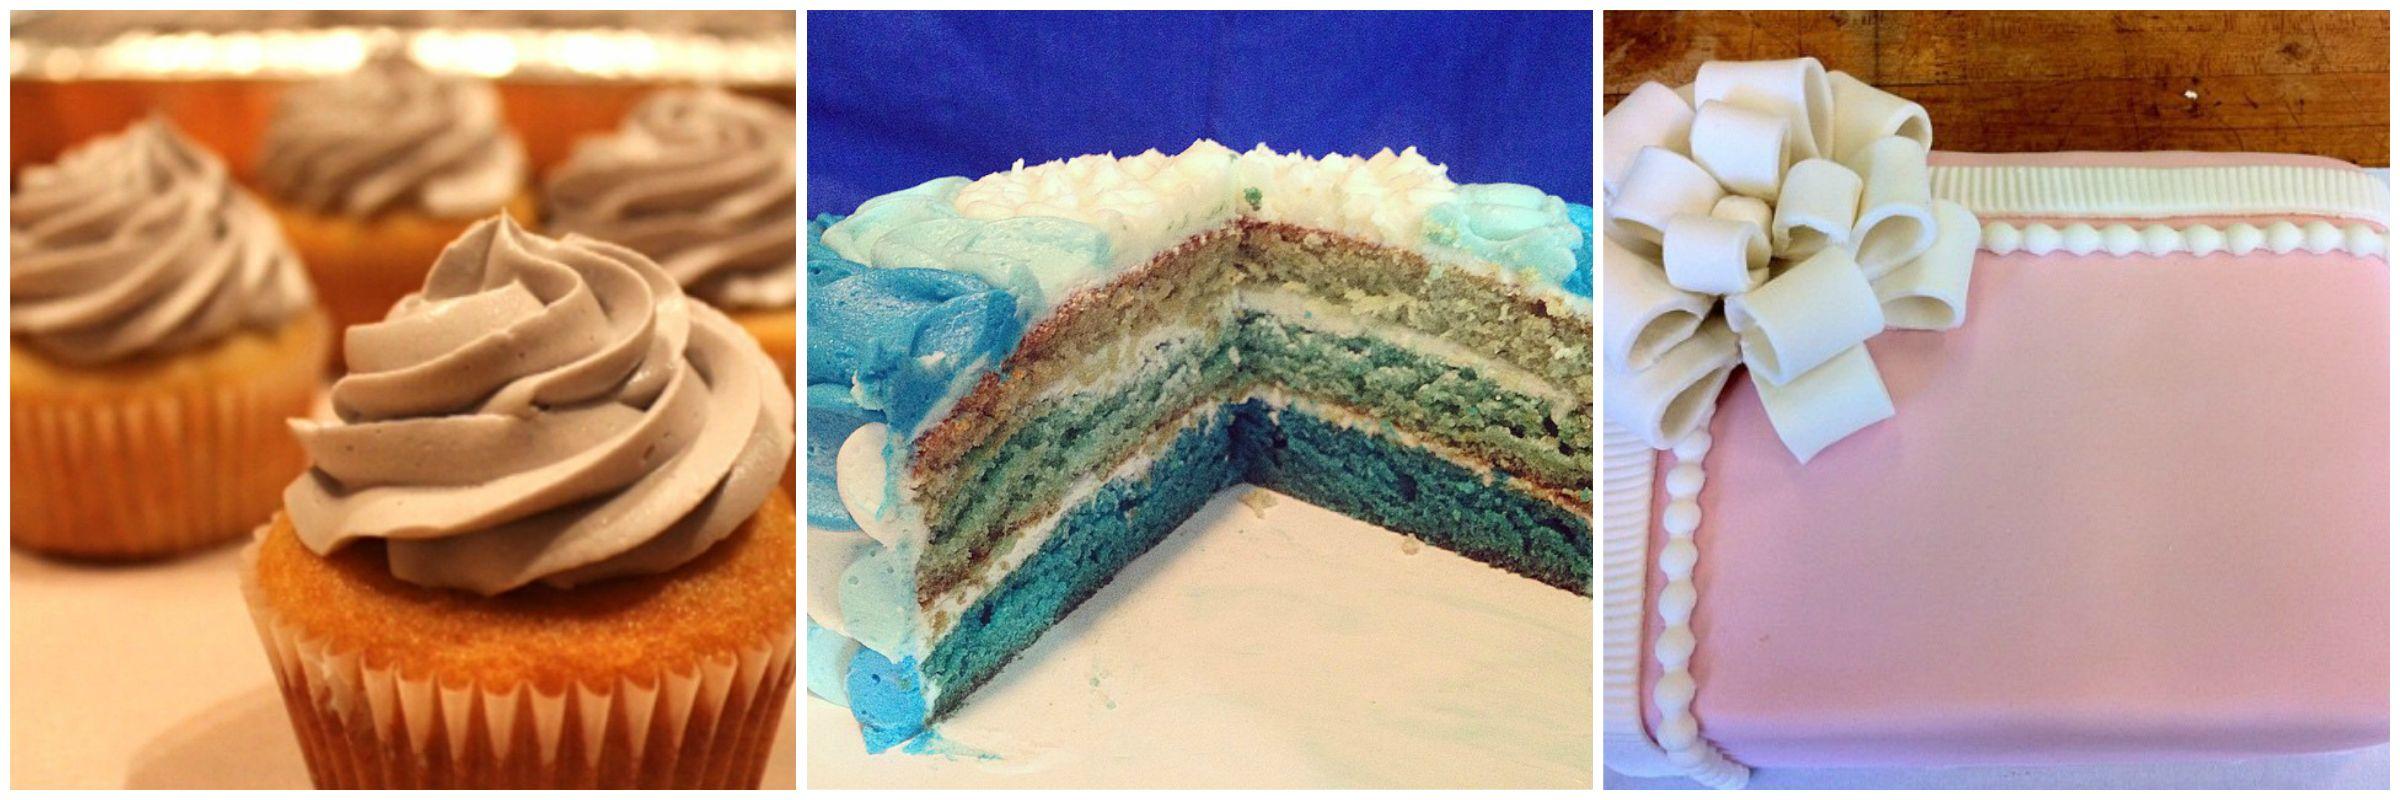 cakeslider.jpg